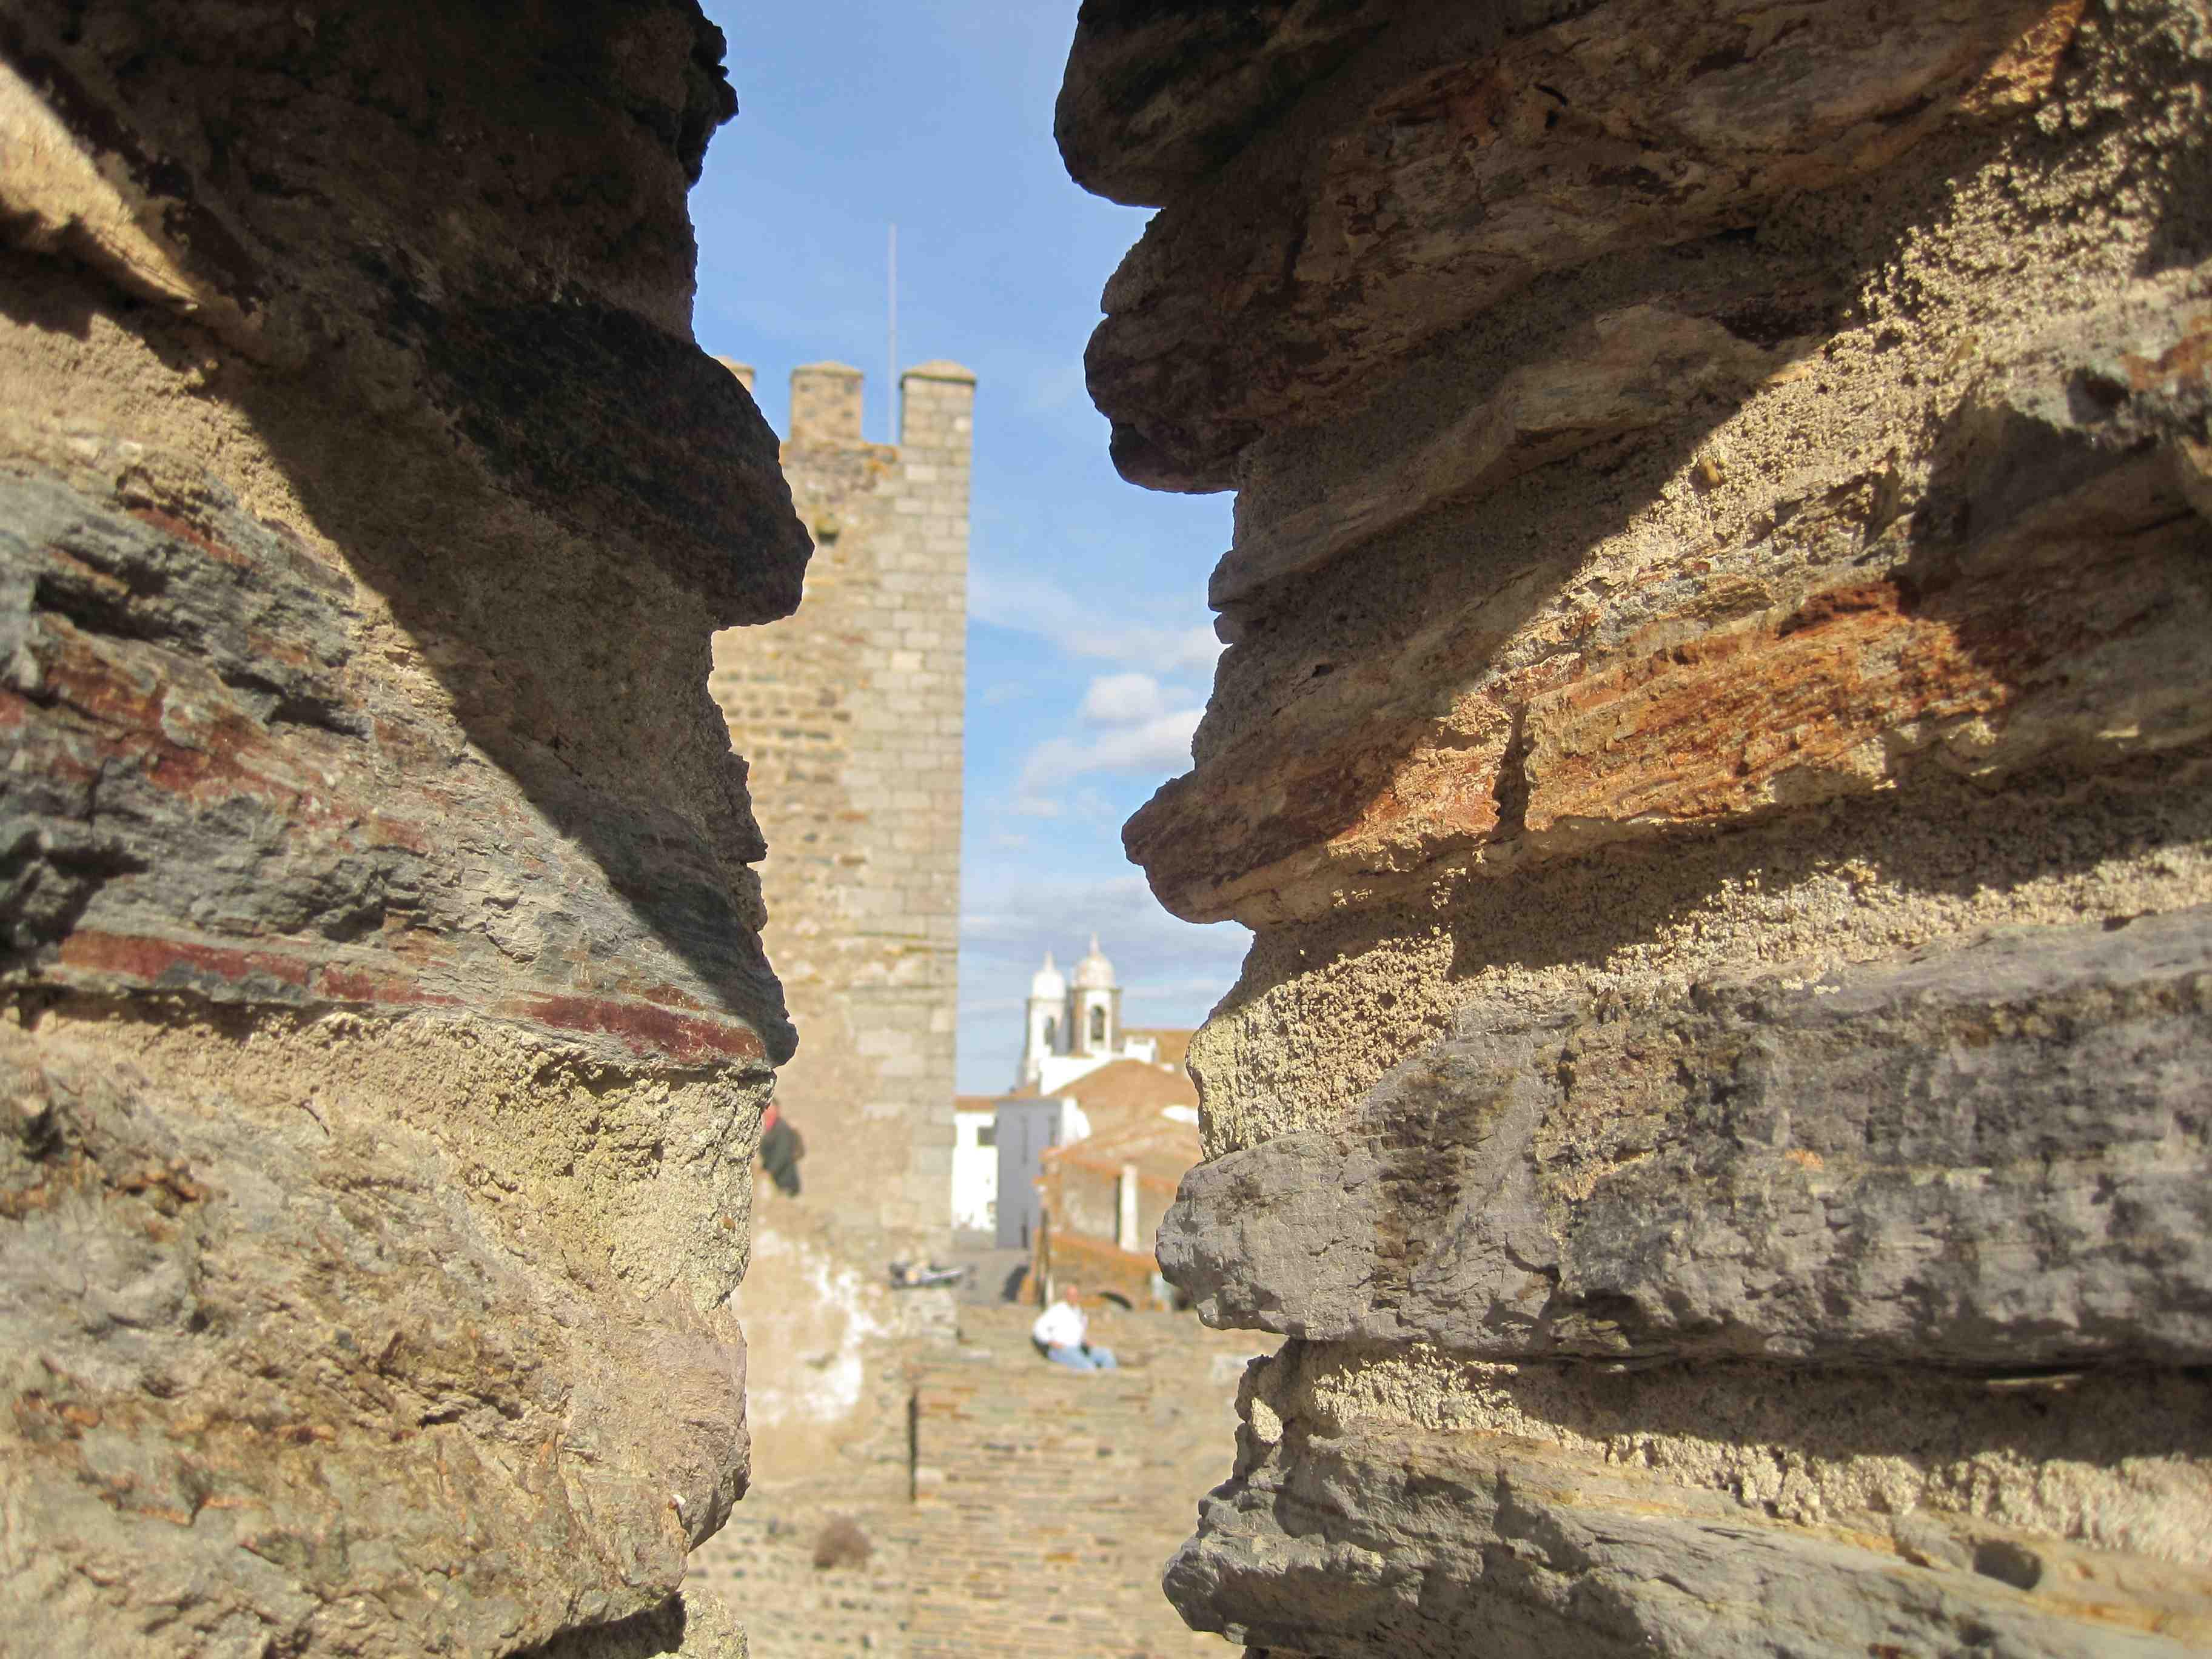 peeking through gun turrets Monsarez Castle Alentejo Portugal